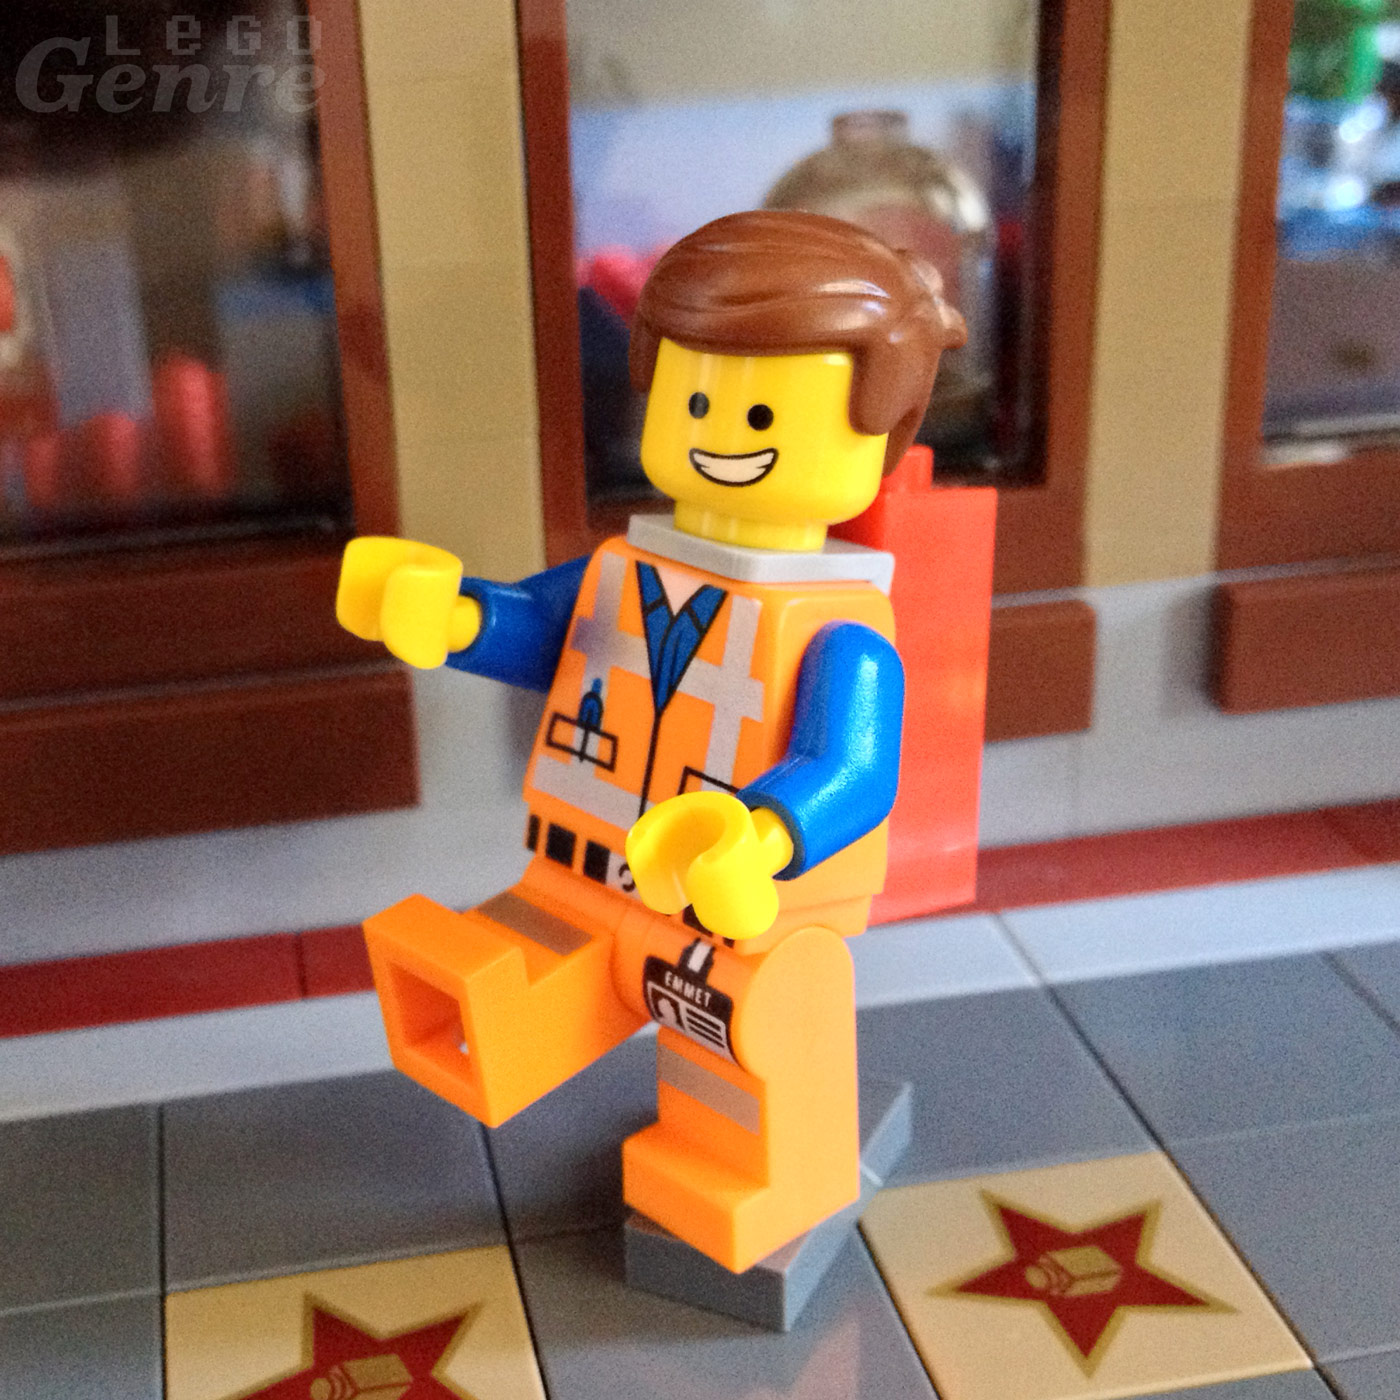 LegoGenre 00380: Wednesdays Are Awesome!